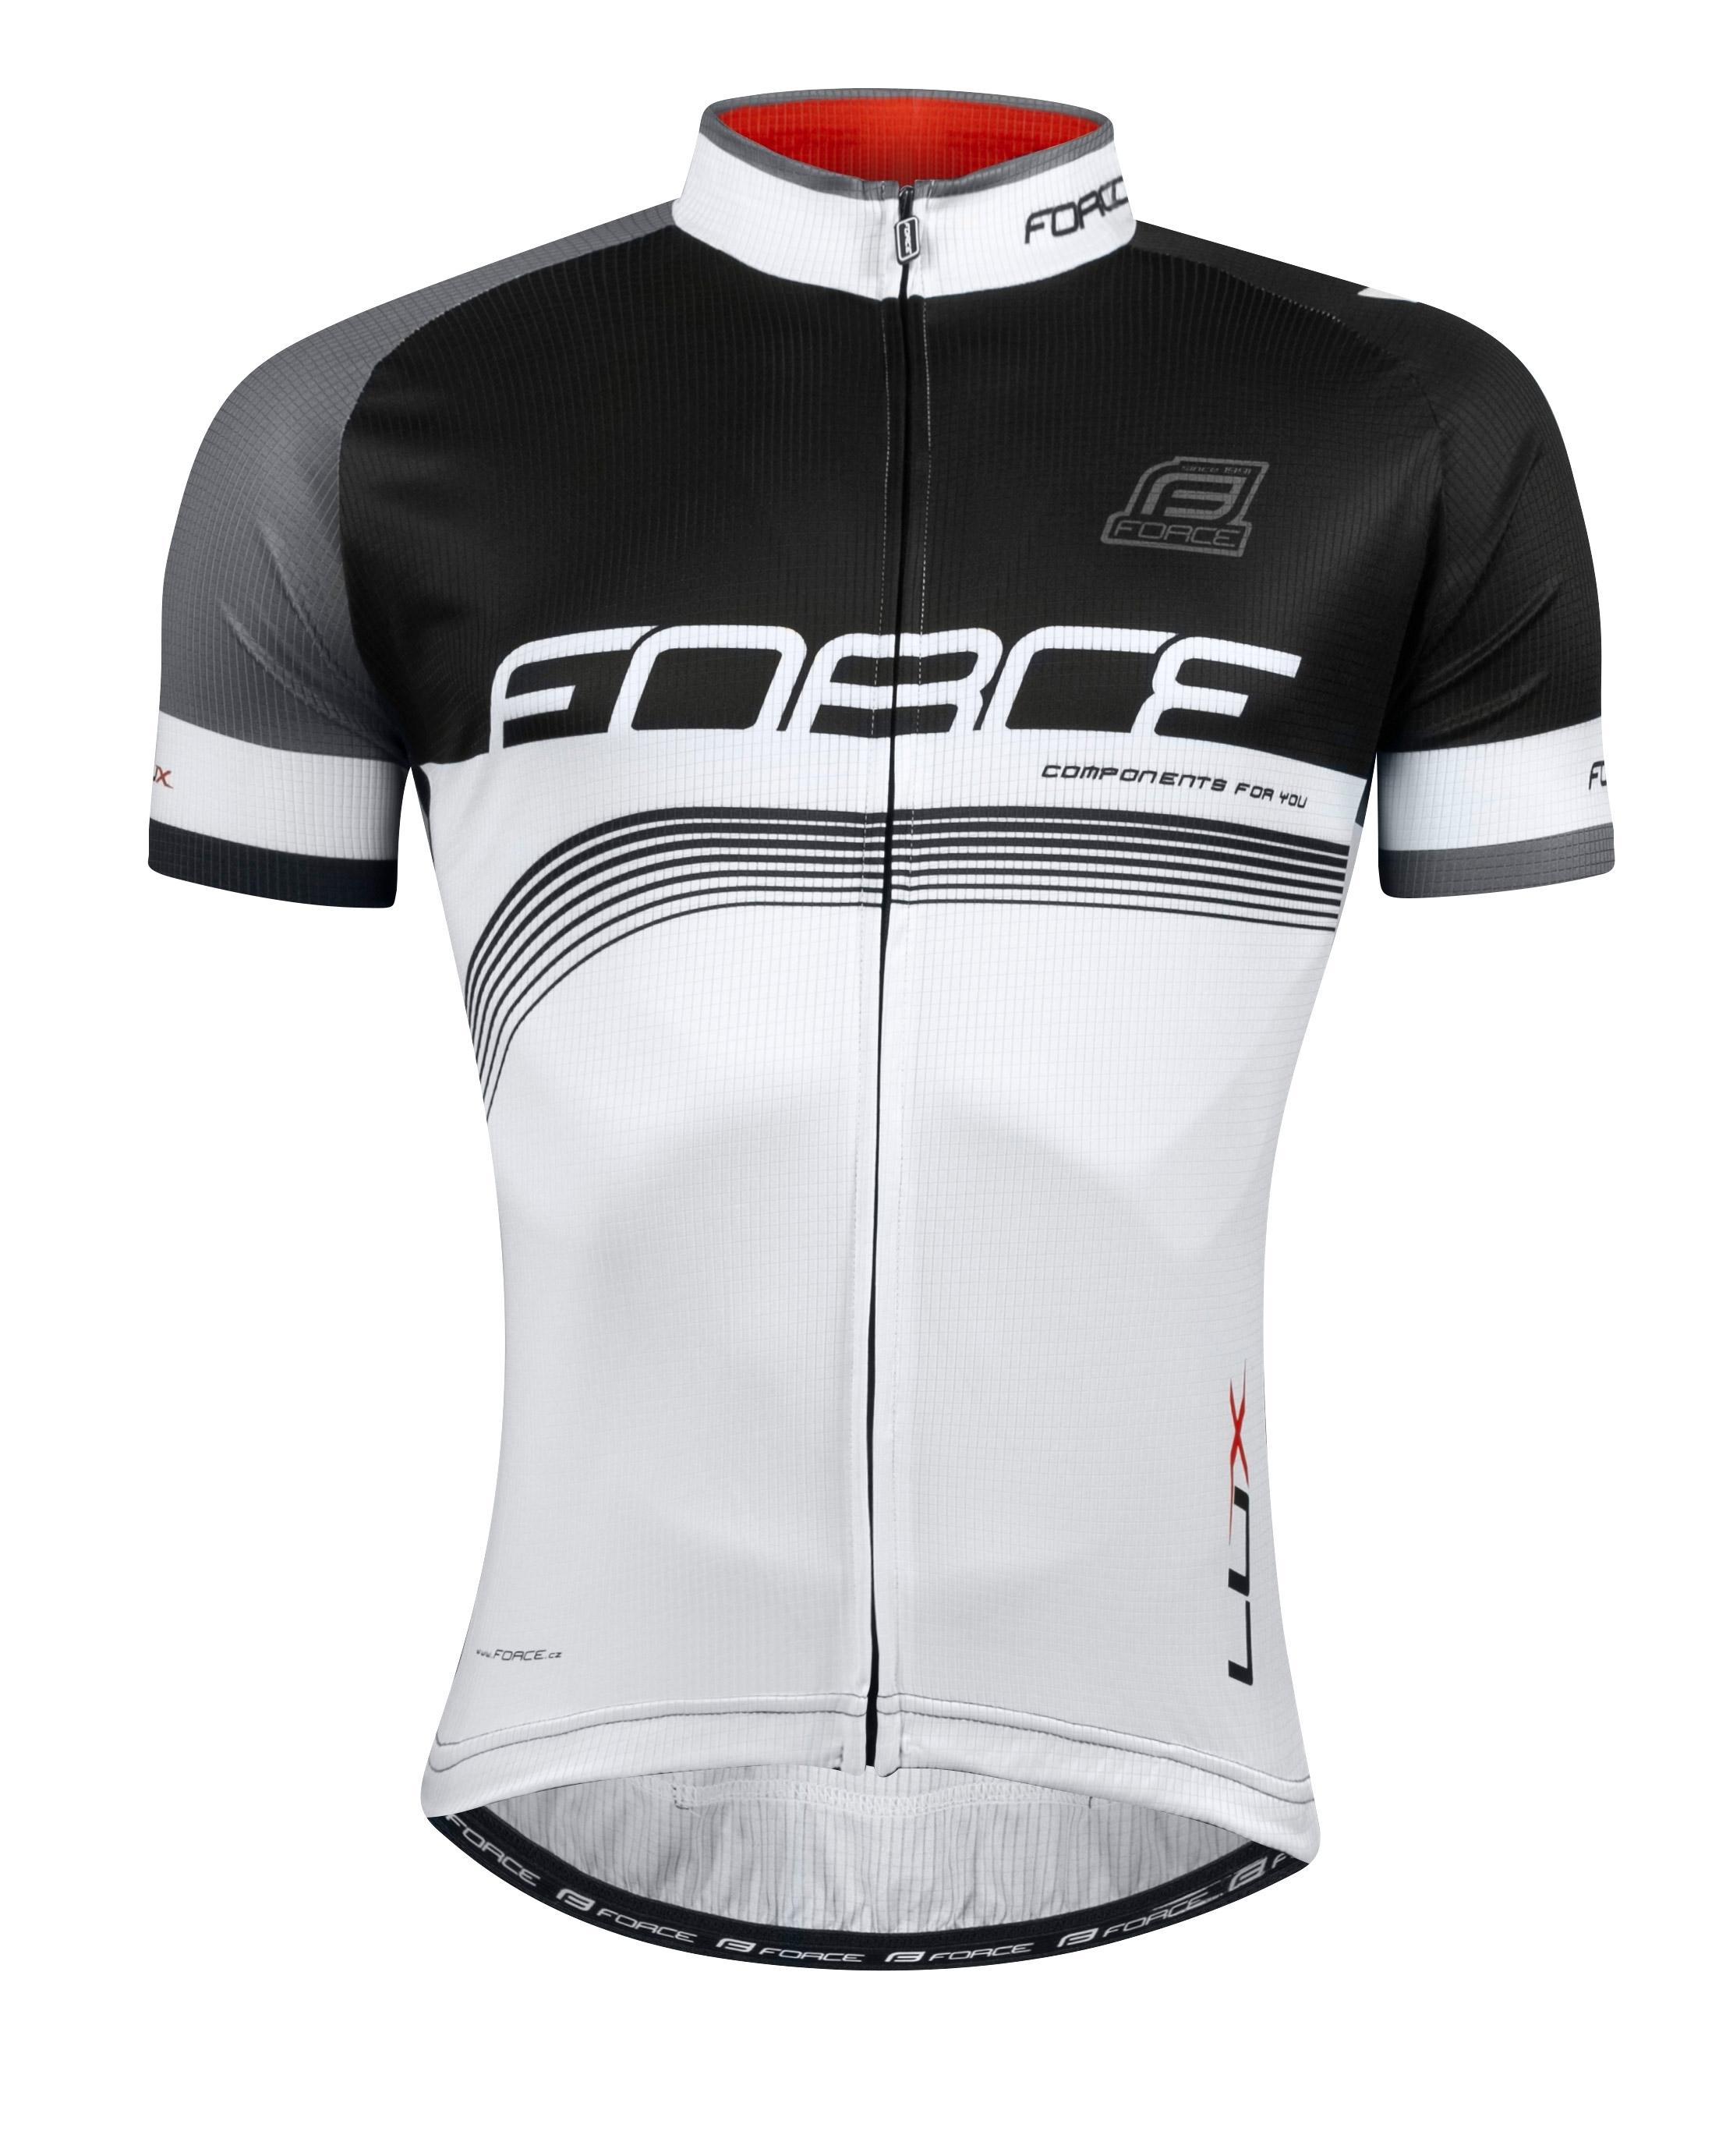 dres FORCE LUX krátký rukáv černo-bílý M